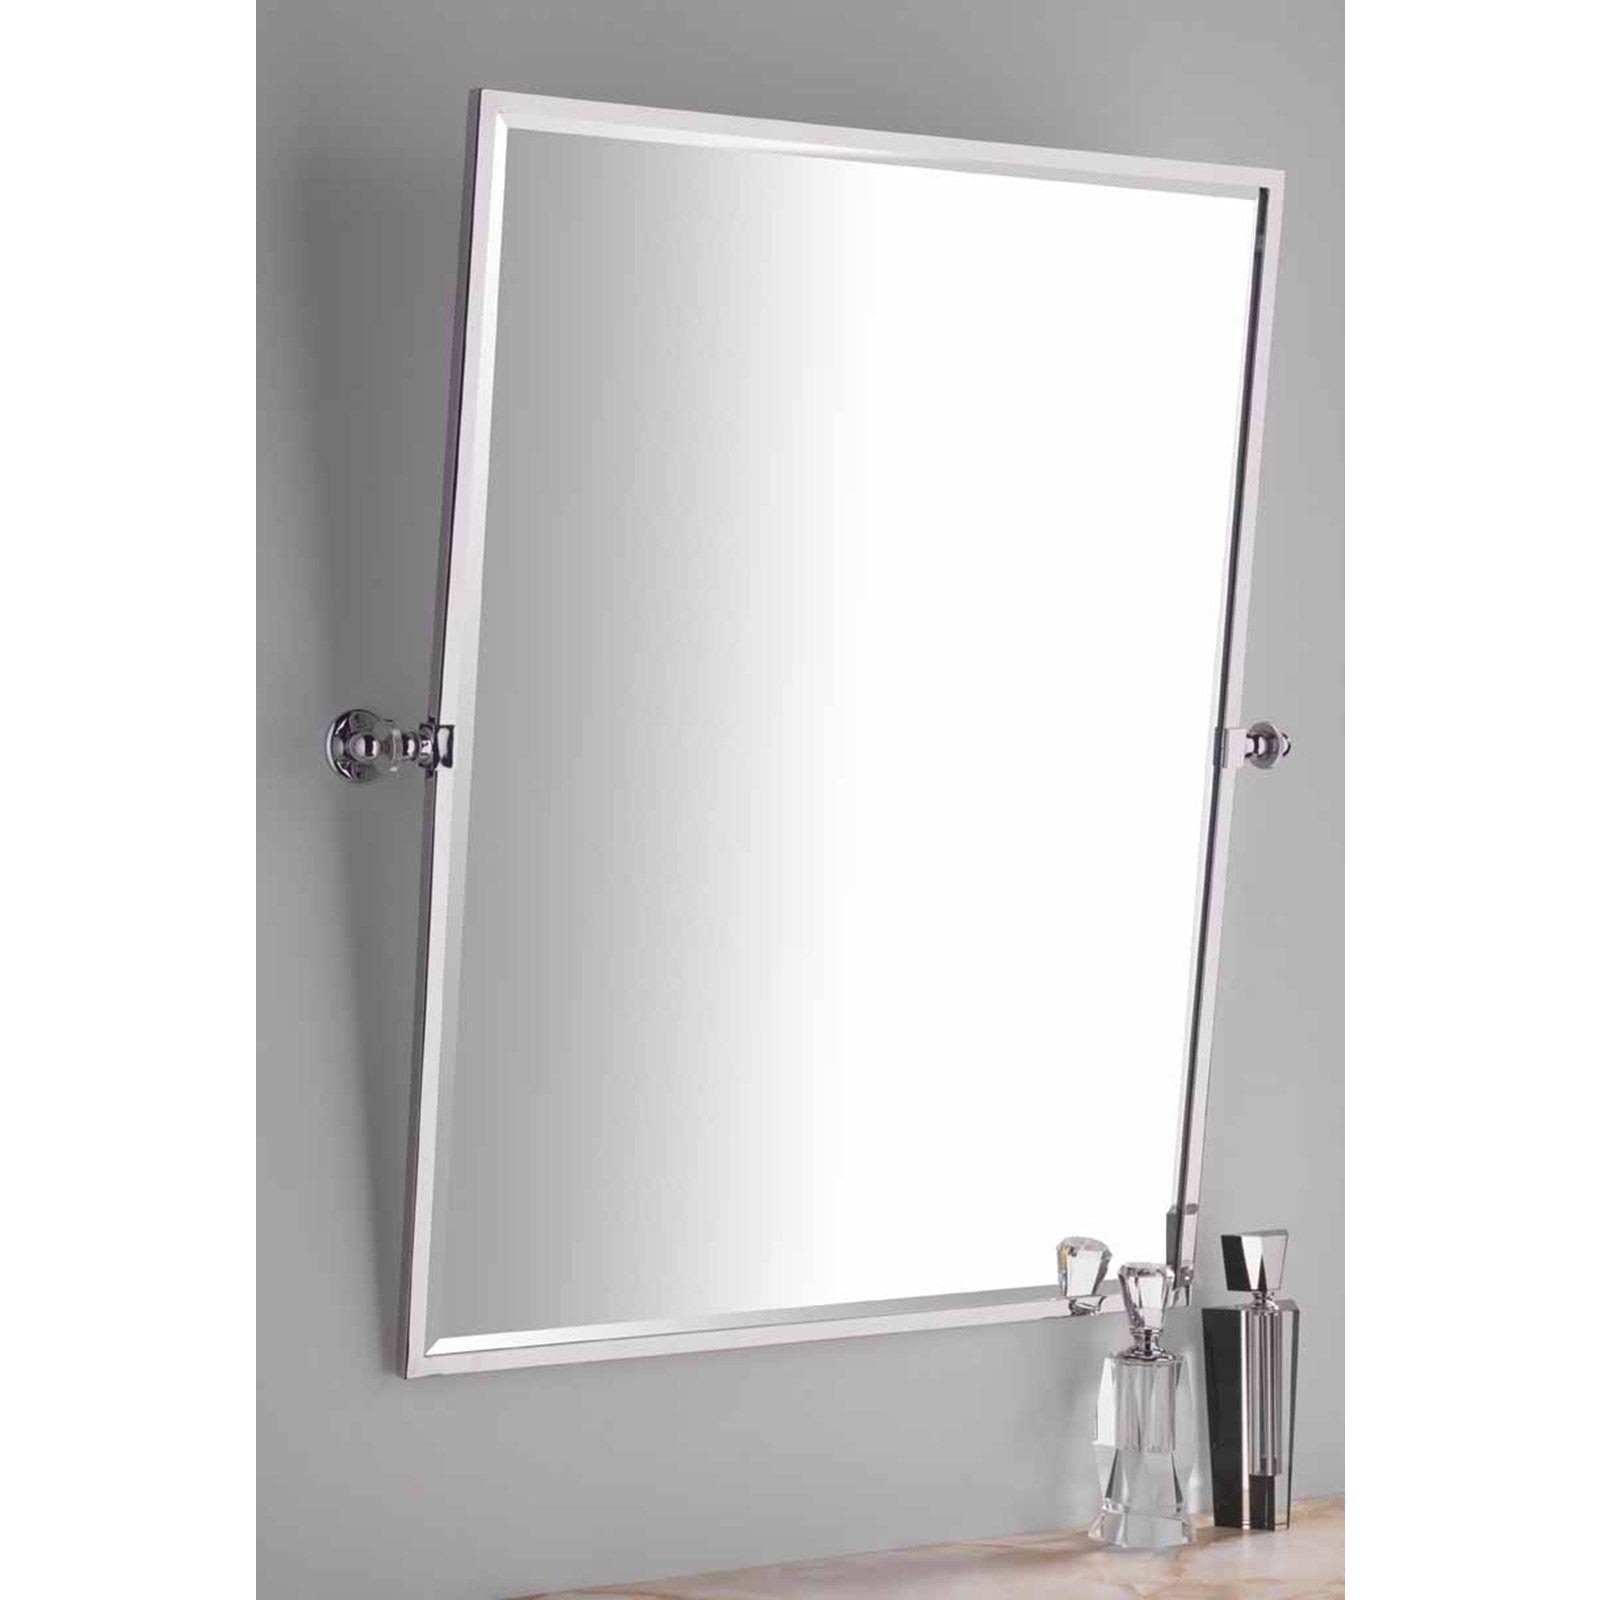 Rectangle Chrome Bathroom Mirror   http://drrw.us   Pinterest ...